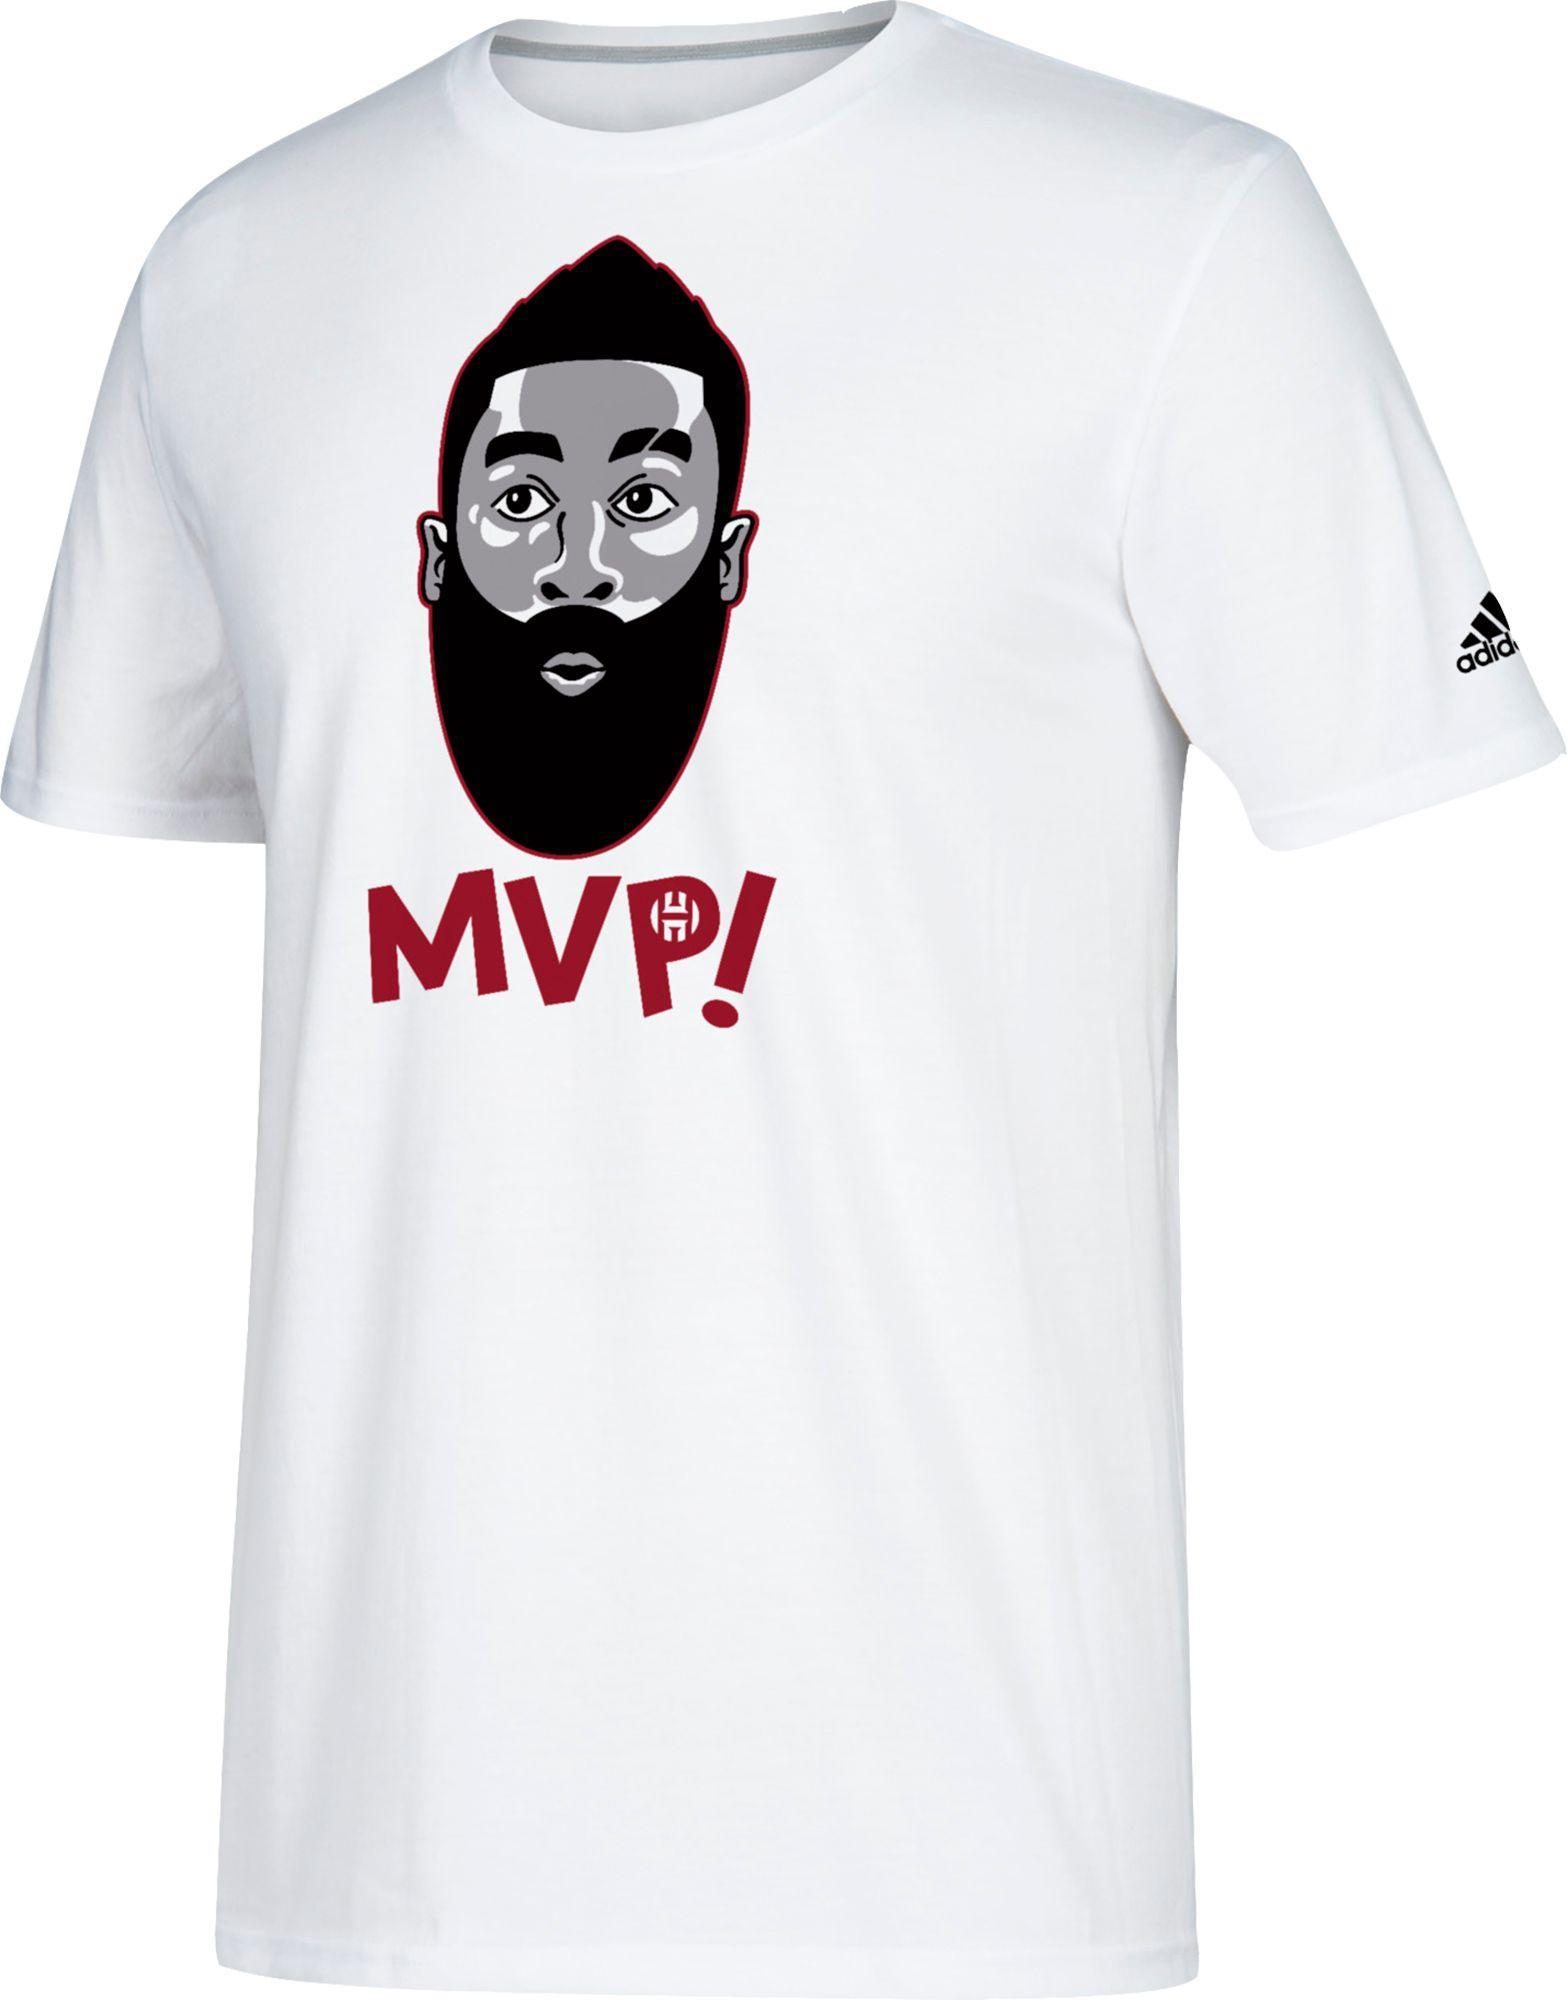 eaeb93253df adidas Harden Mvp Graphic T-shirt in White for Men - Lyst